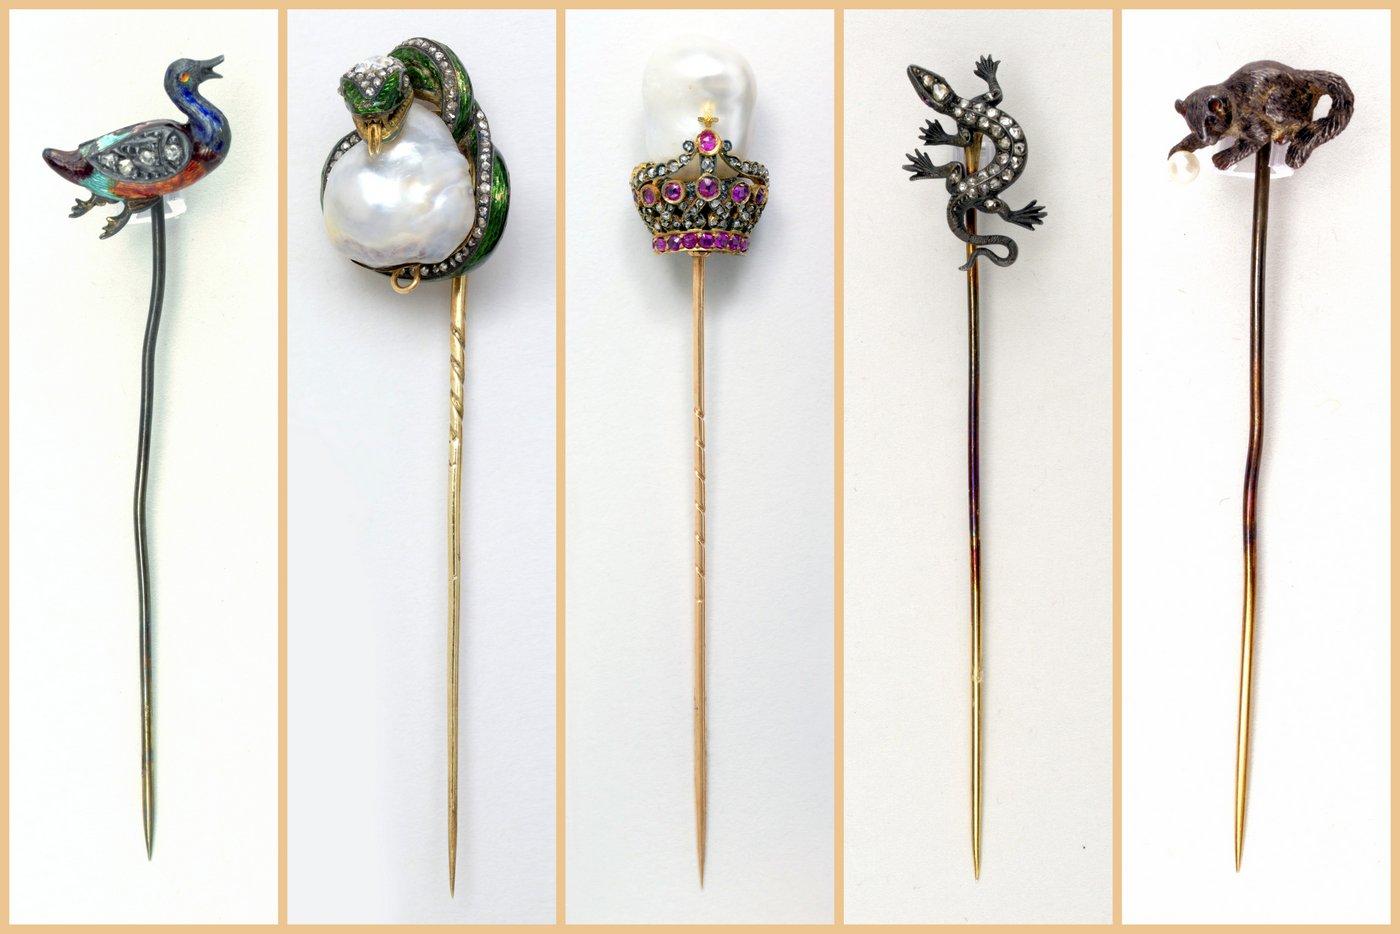 Antique stickpins and scarf pins